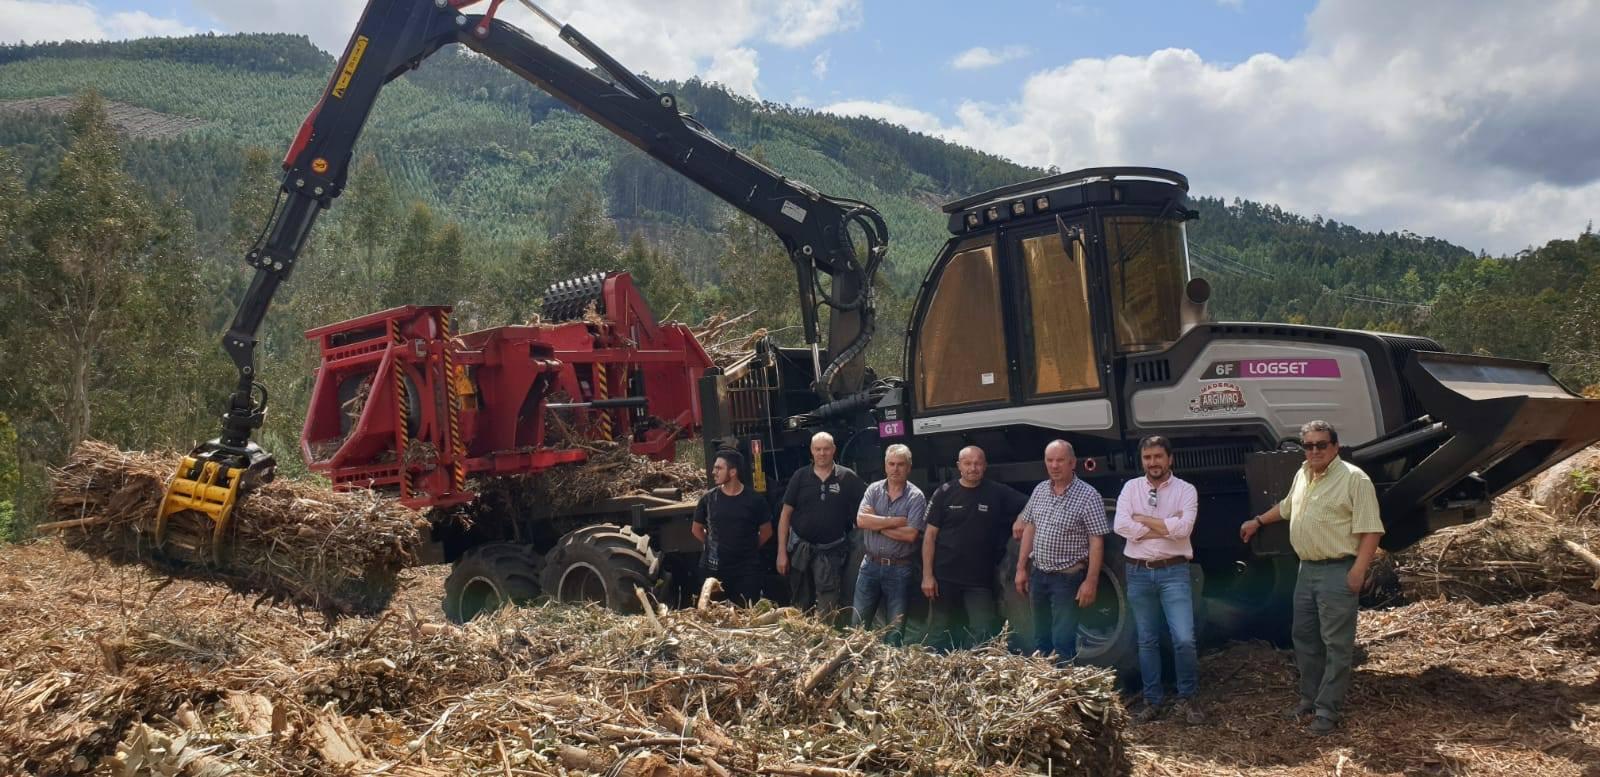 TECMAF FOREST PIONEER GREENALIA4 ORIXINAL